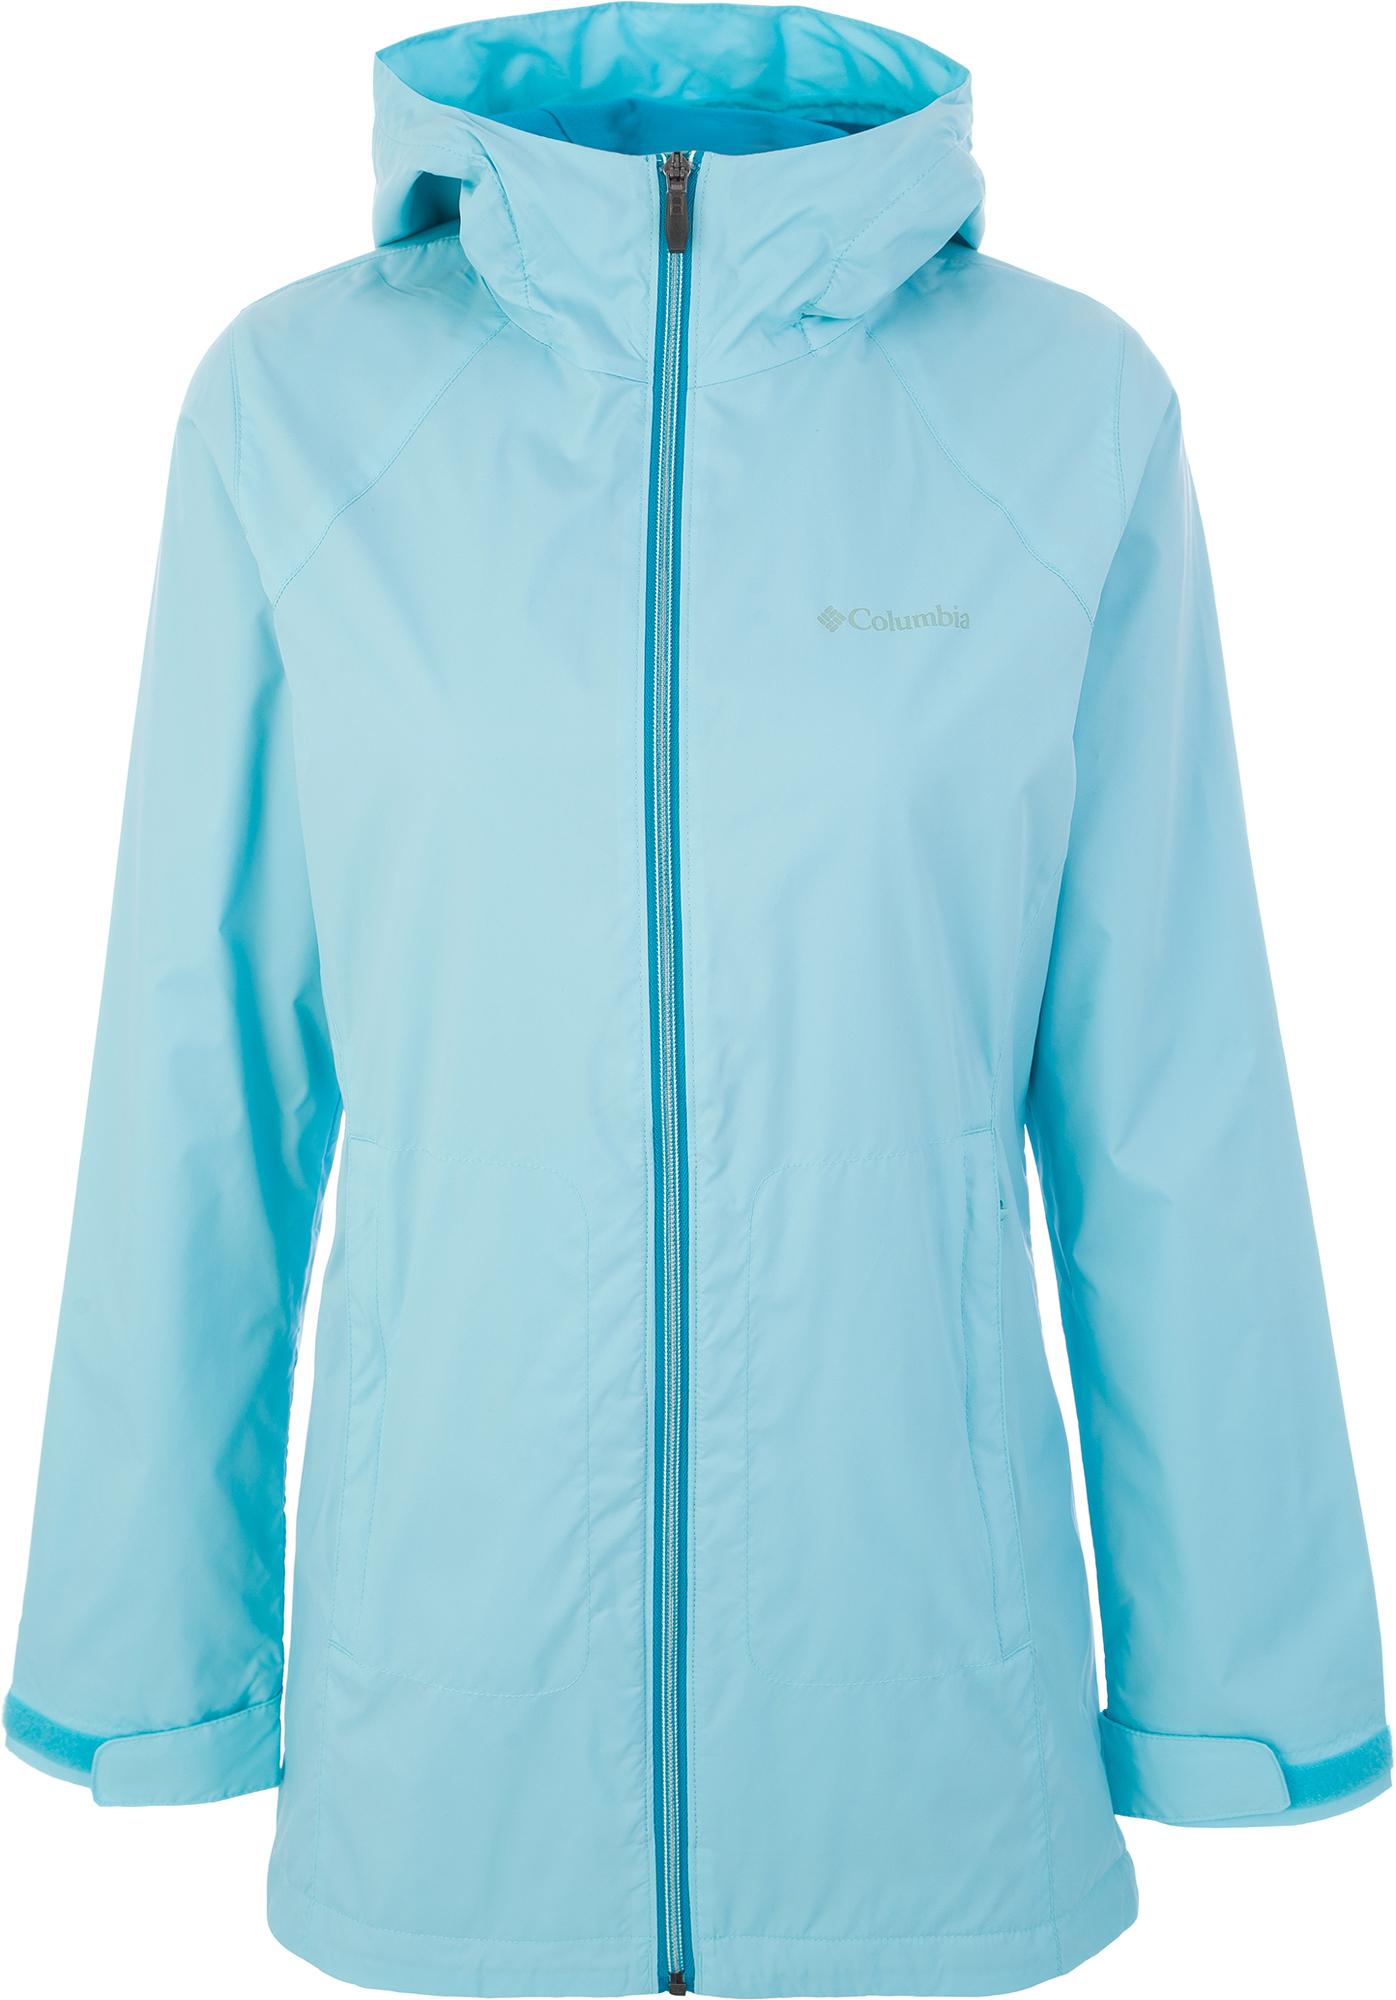 Columbia Куртка утепленная женская Columbia Switchback Lined, размер 50